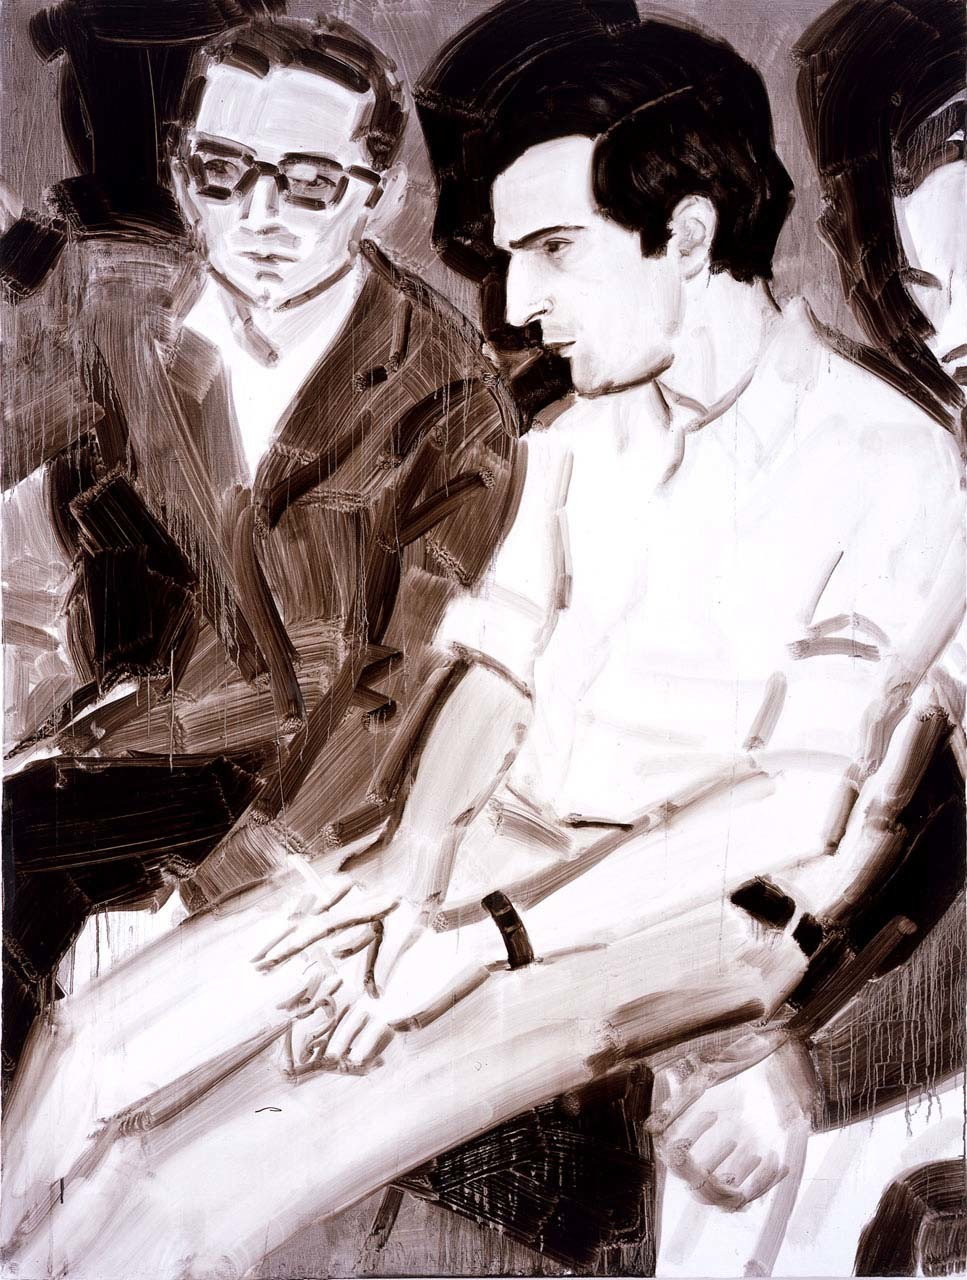 "<div class=""artwork_caption""><p>Truffaut at the Cannes Film Festival 1968, 2005</p></div>"